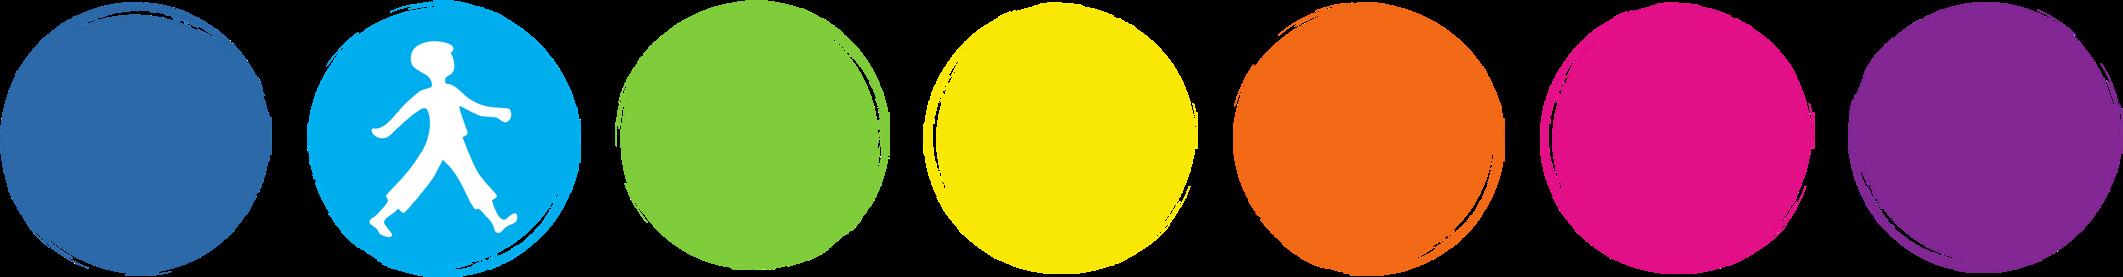 circles-line-1